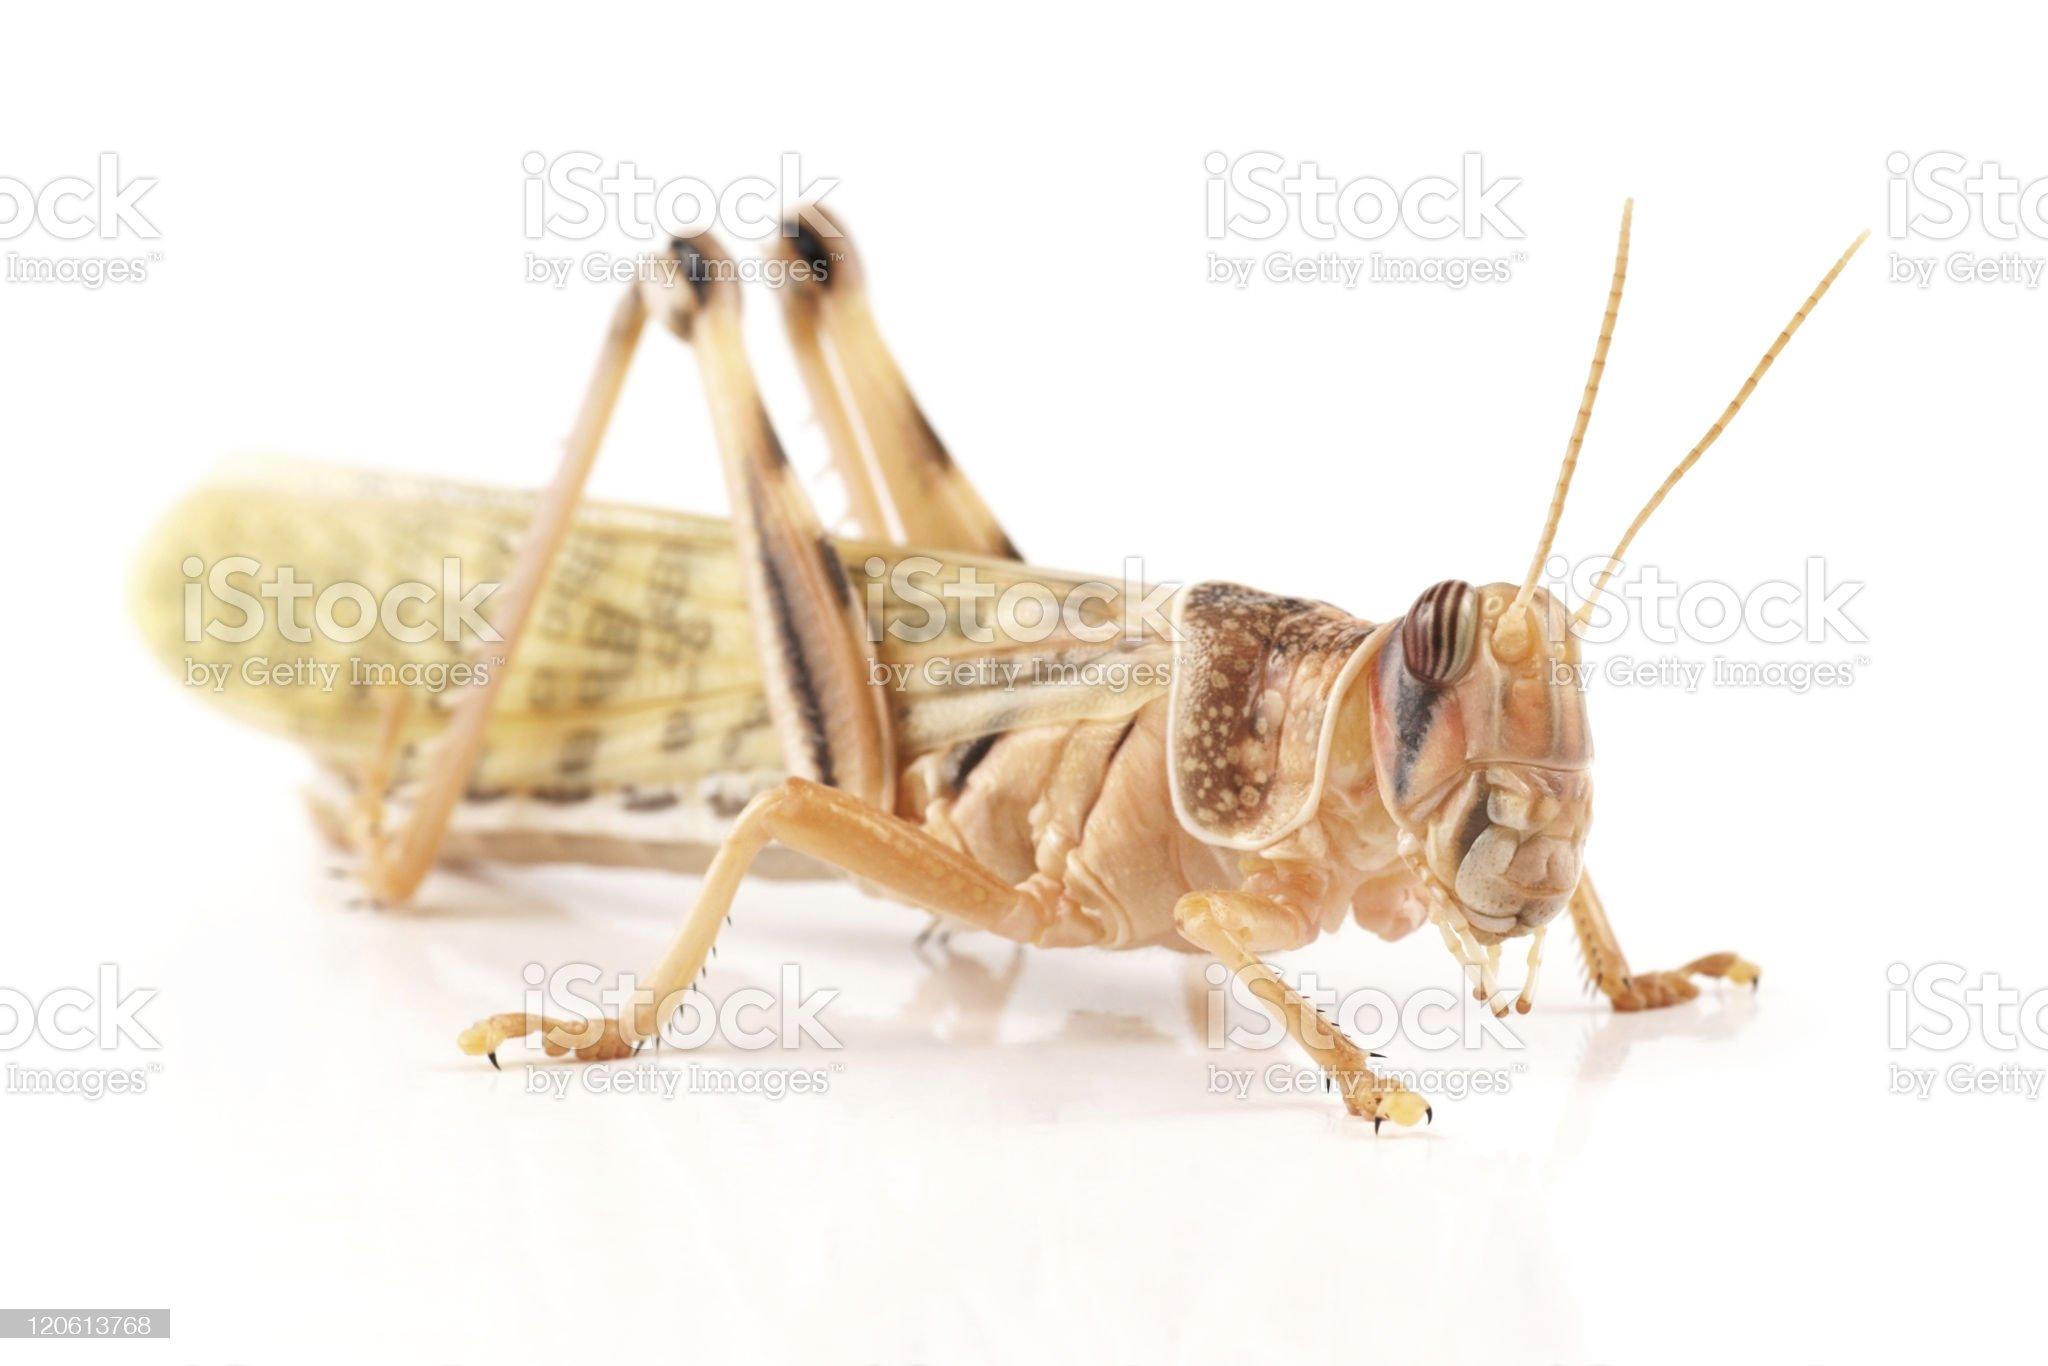 Desert locust (Schistocerca gregaria) royalty-free stock photo